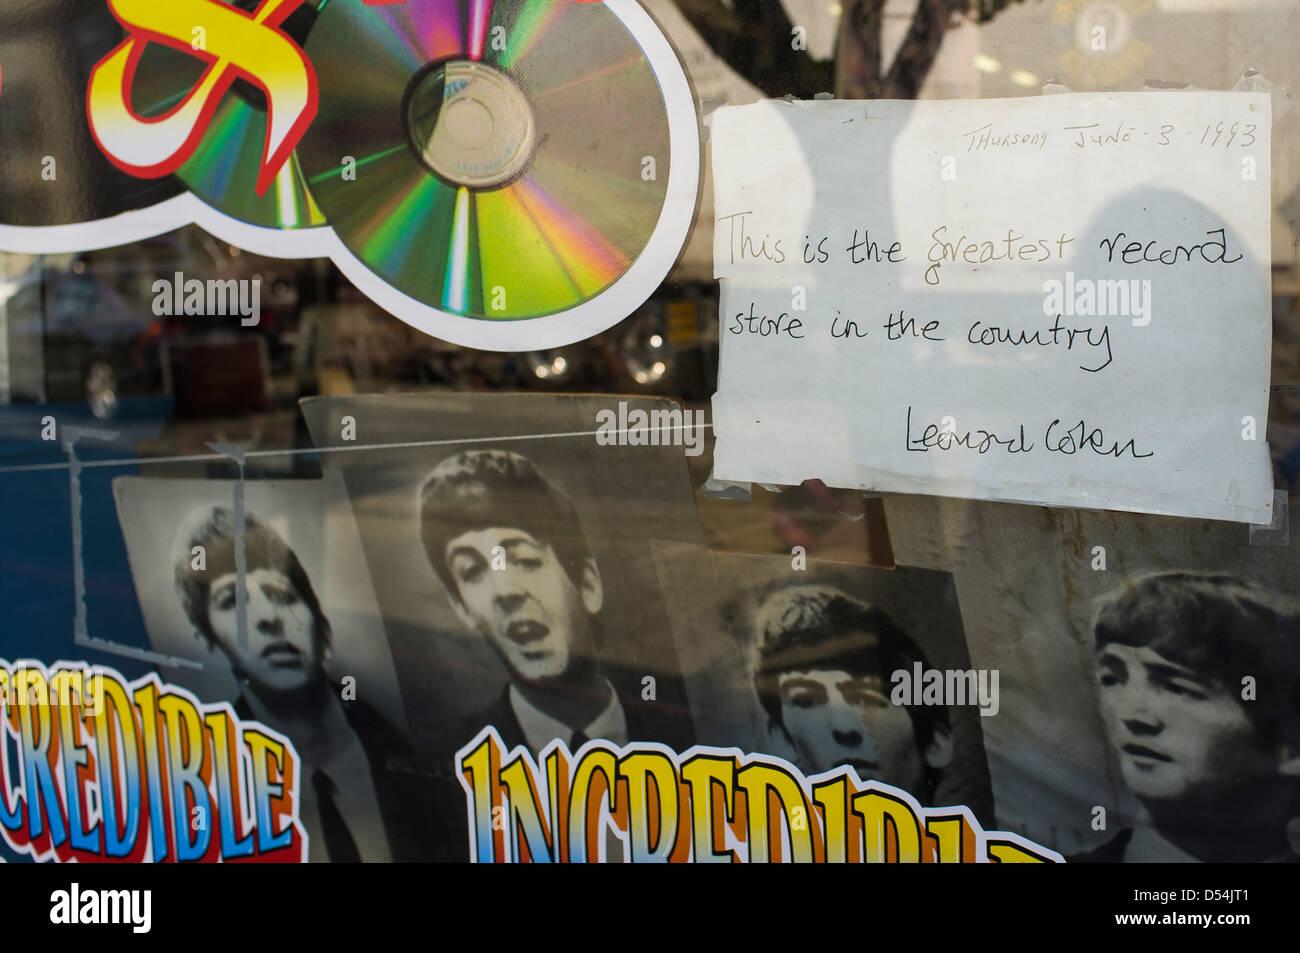 Record store window, Sebastopol, California, United States - Stock Image